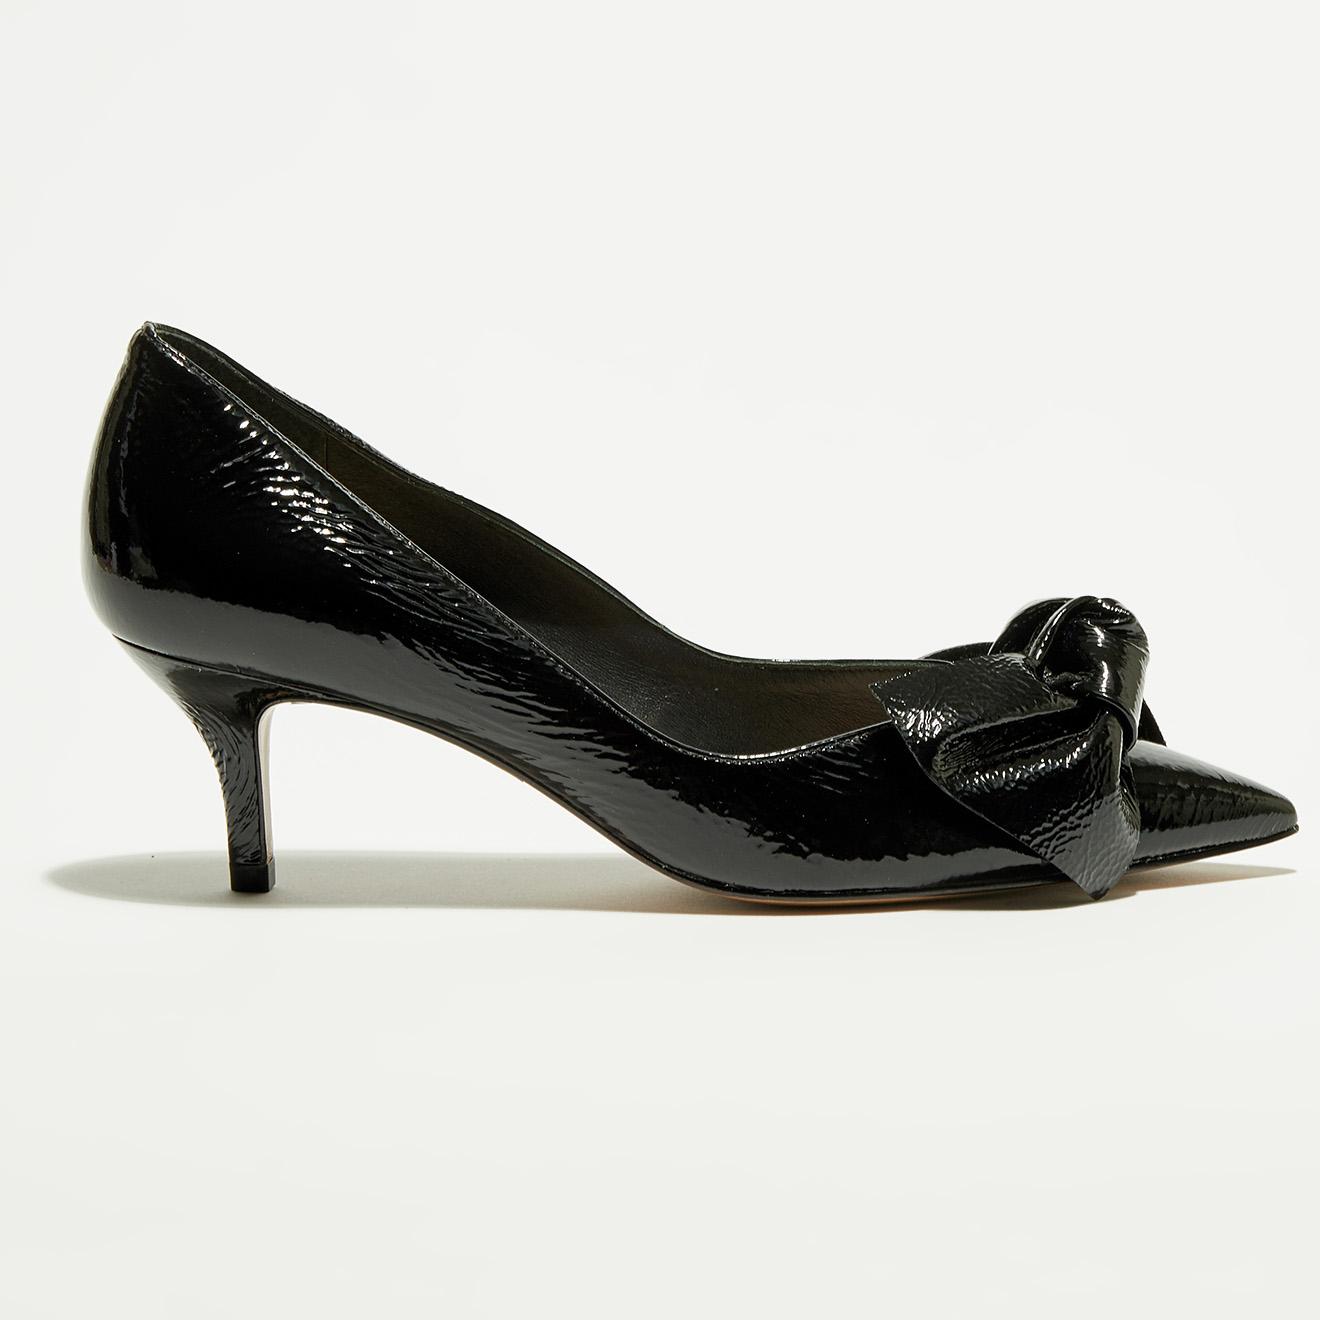 Escarpins en Cuir Venisa noirs - Talon 5 cm - Cosmoparis - Modalova